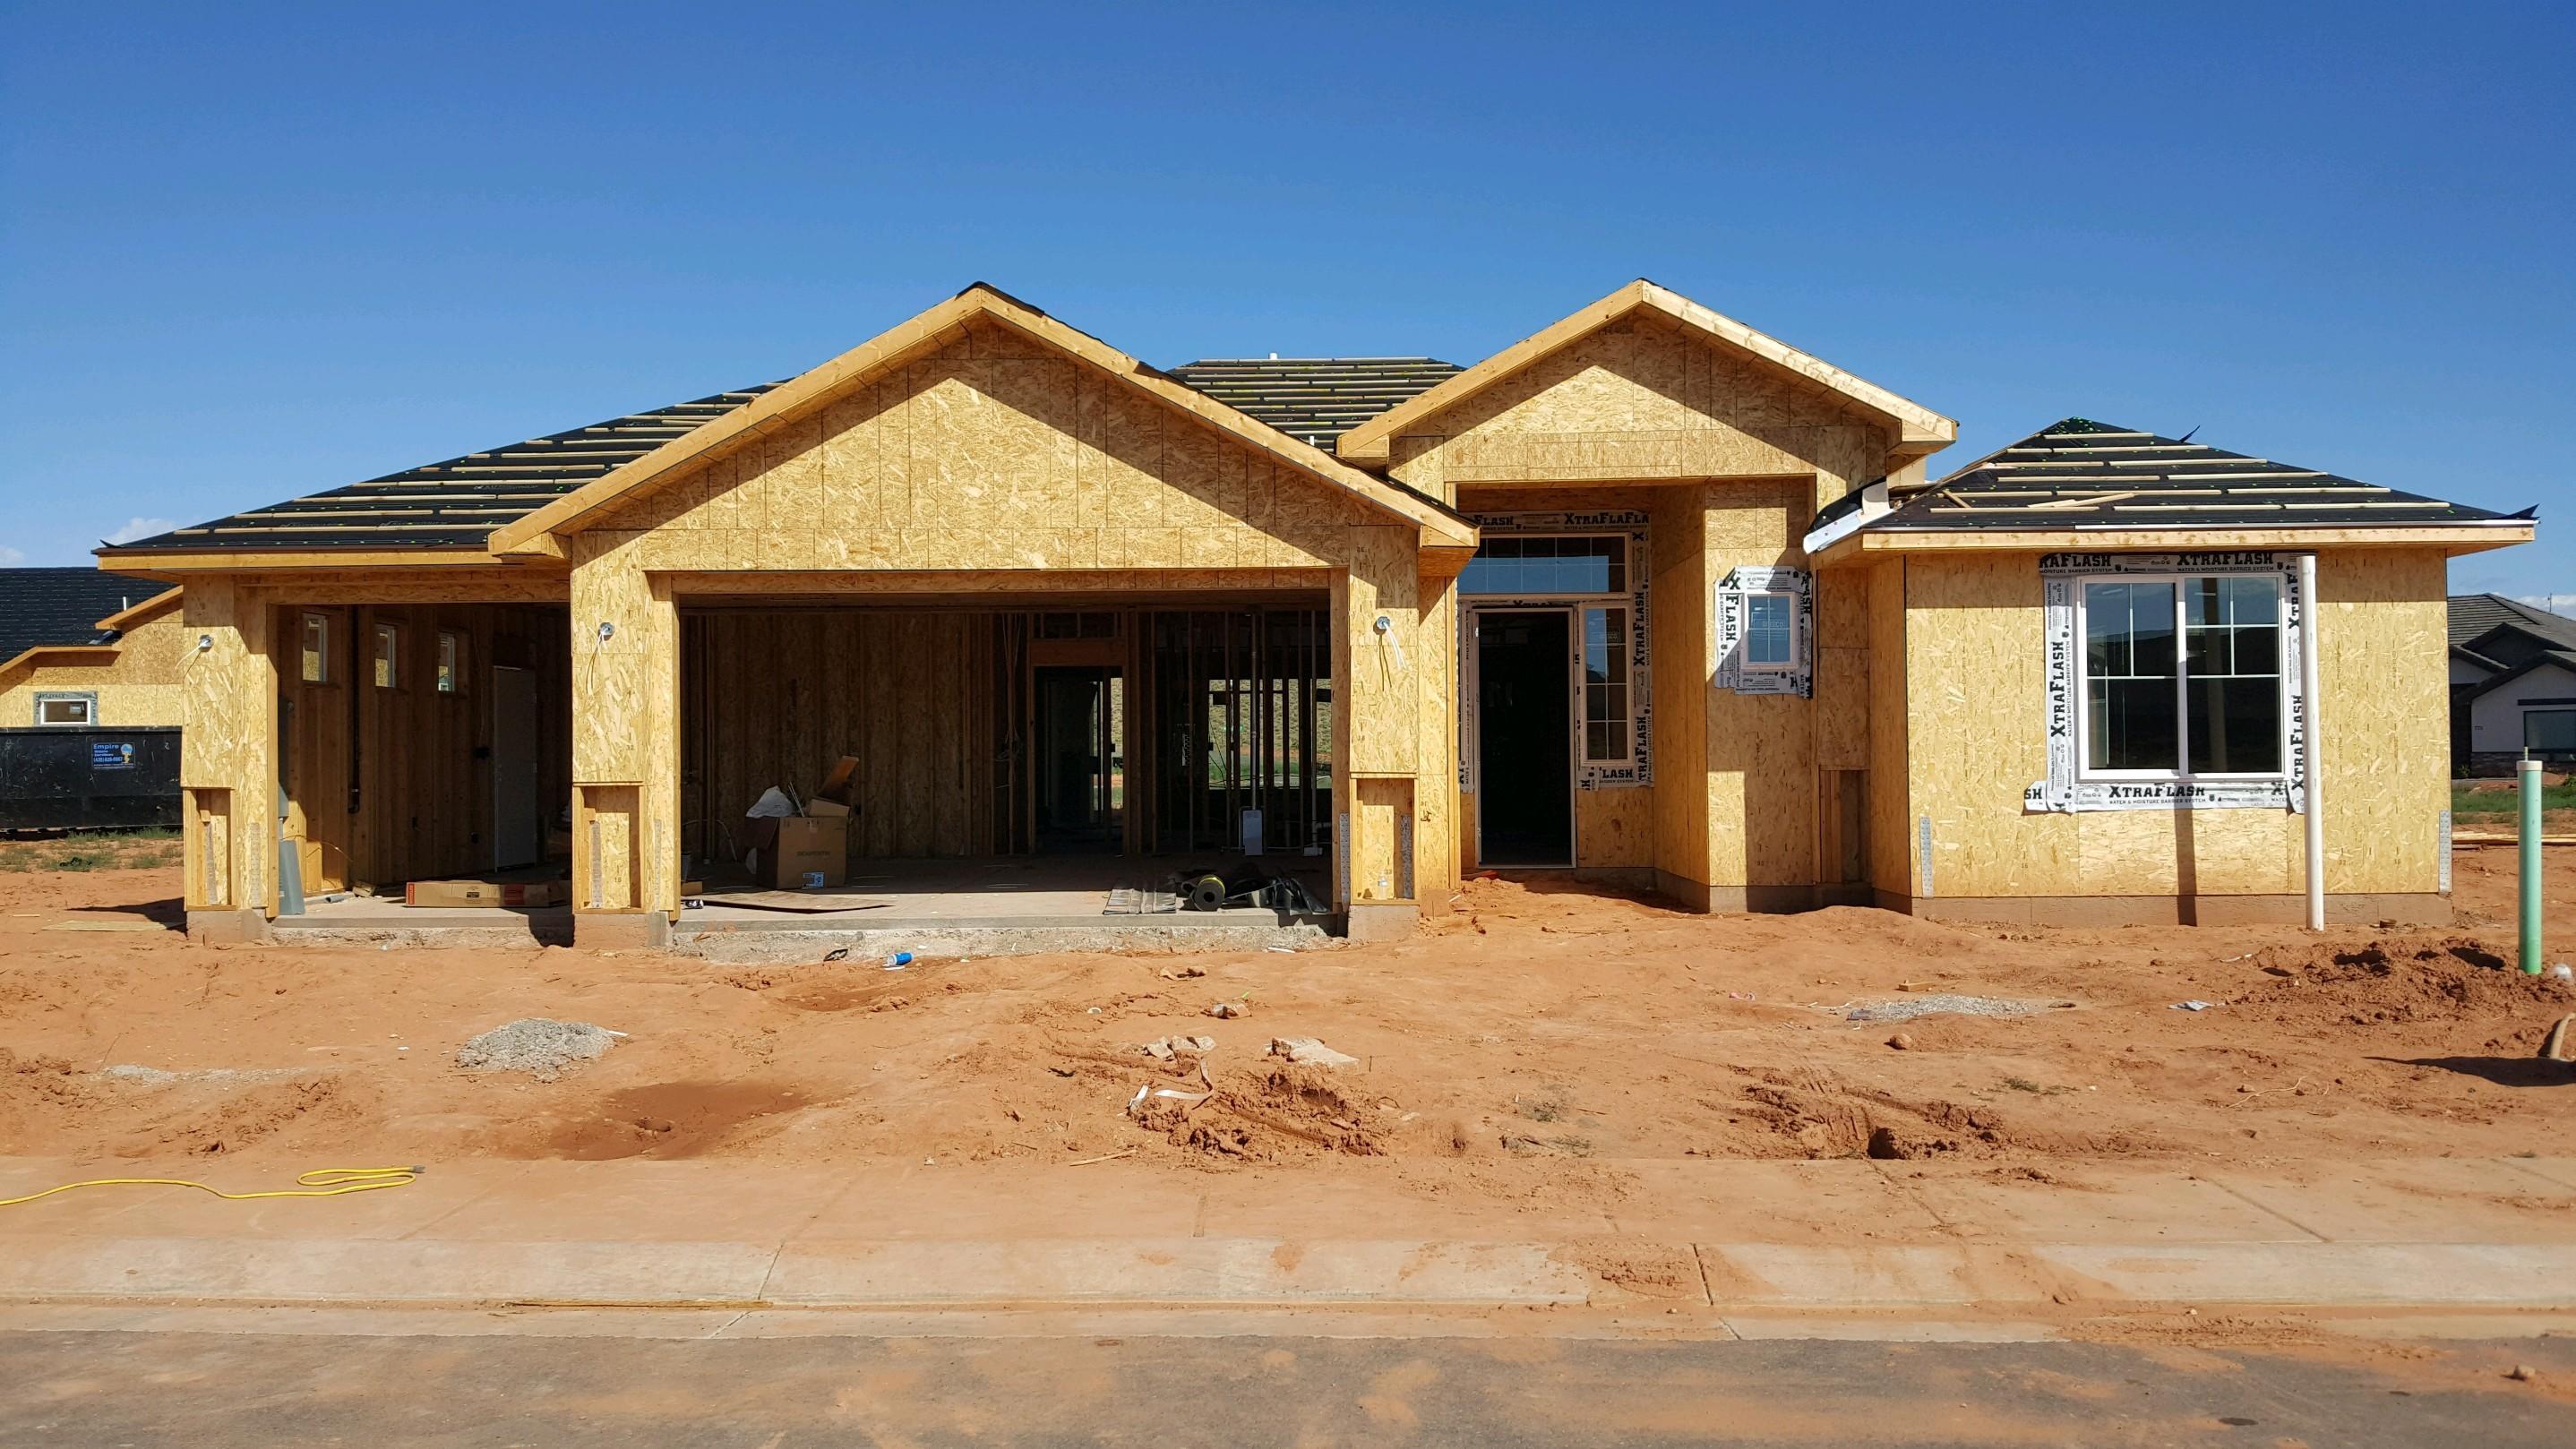 4789 Homestead Way Washington Utah 84780 Land for Sale